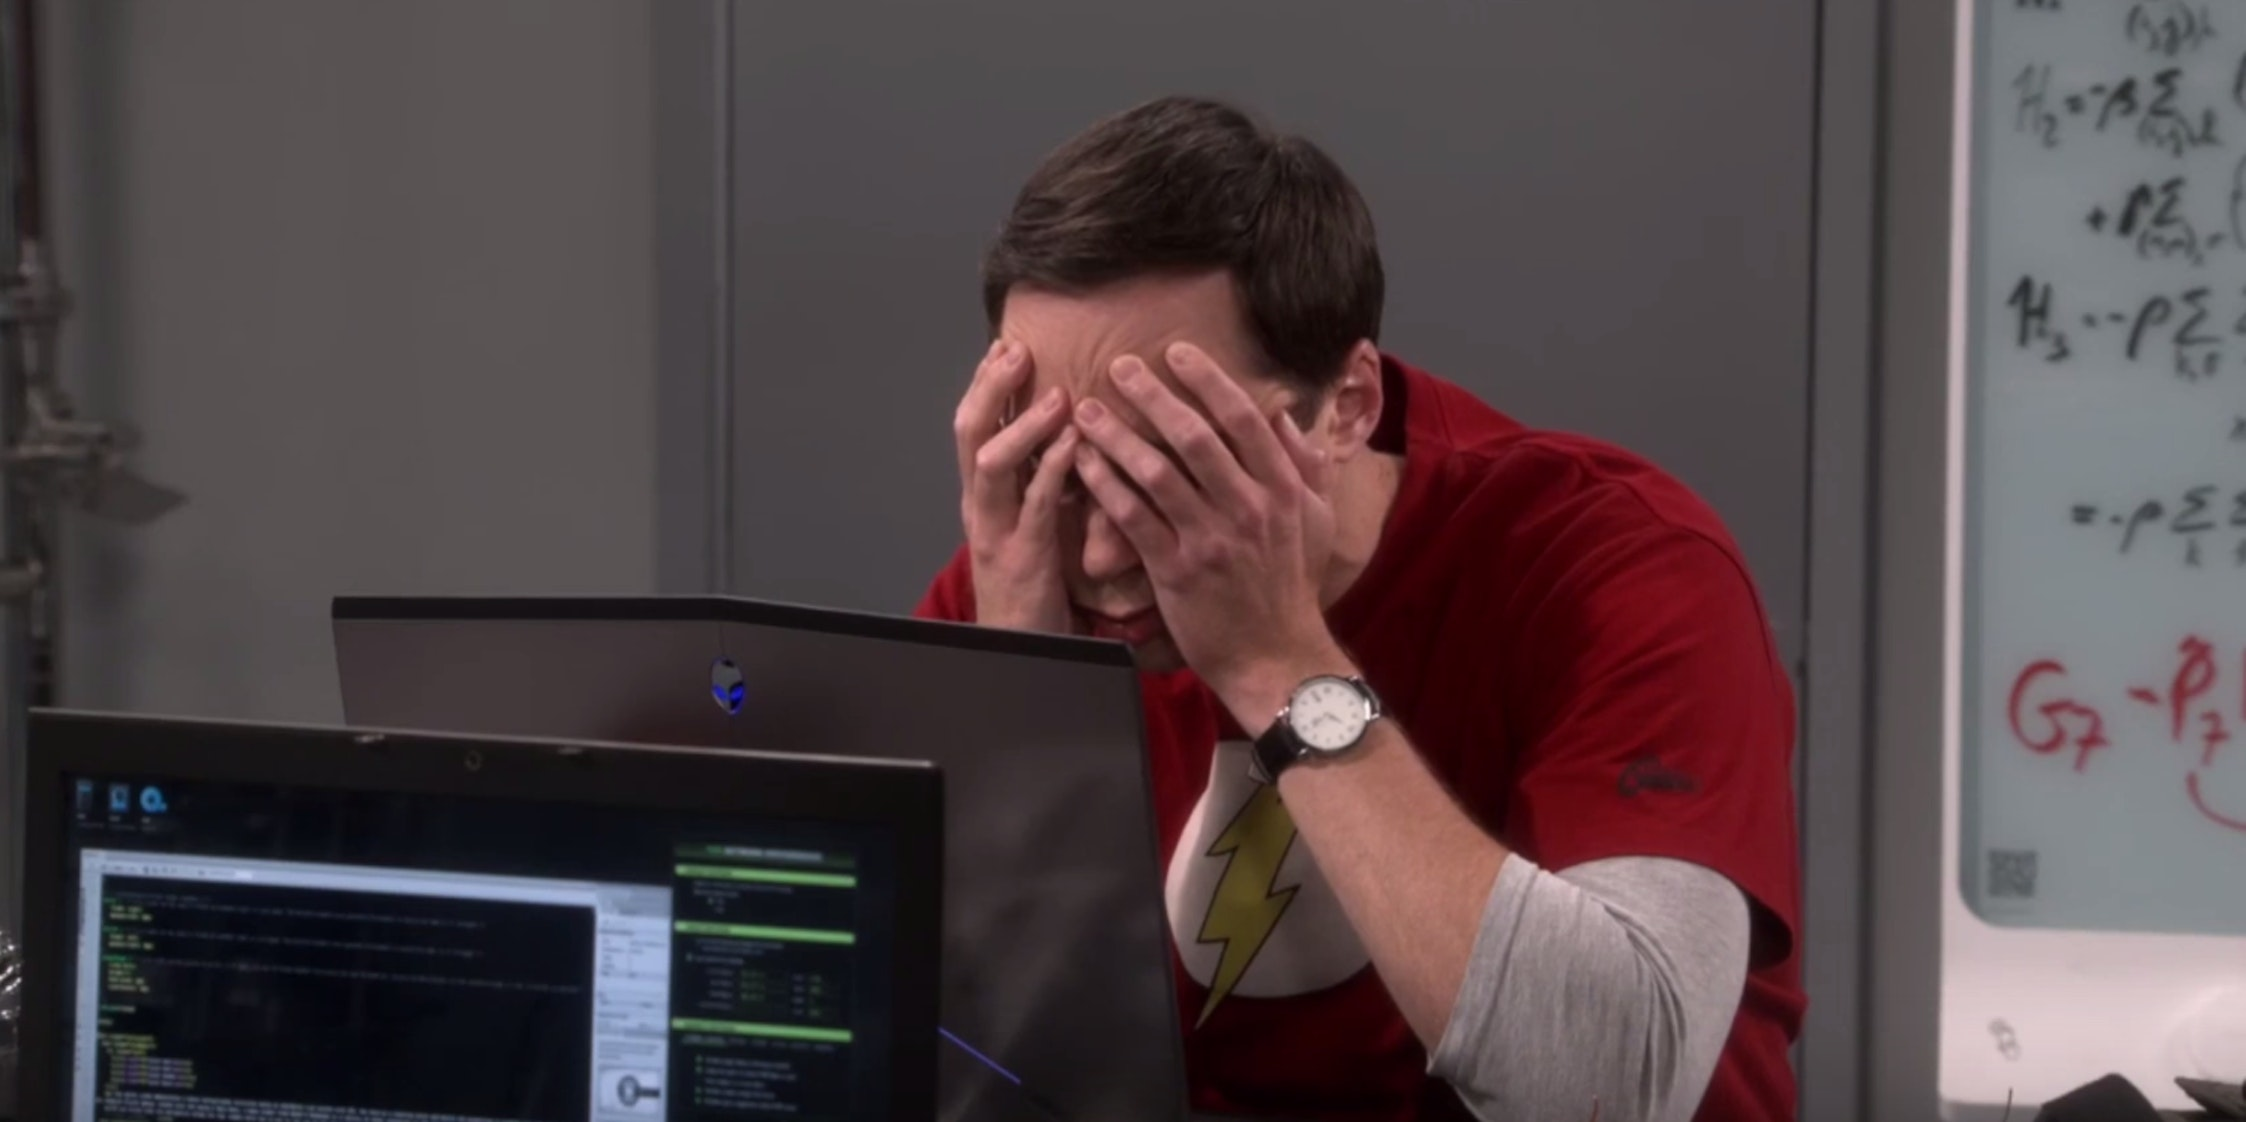 Sheldon claims he suffers from caffeine addiction.